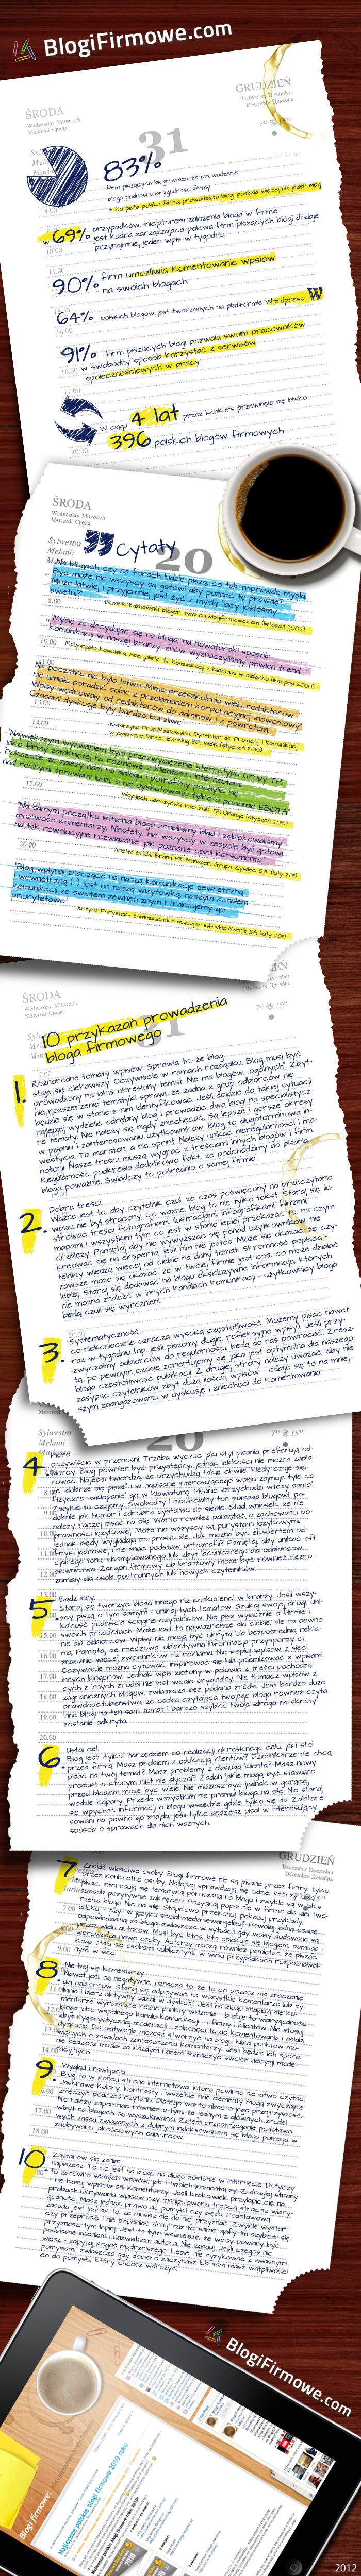 infografika blogi firmowe